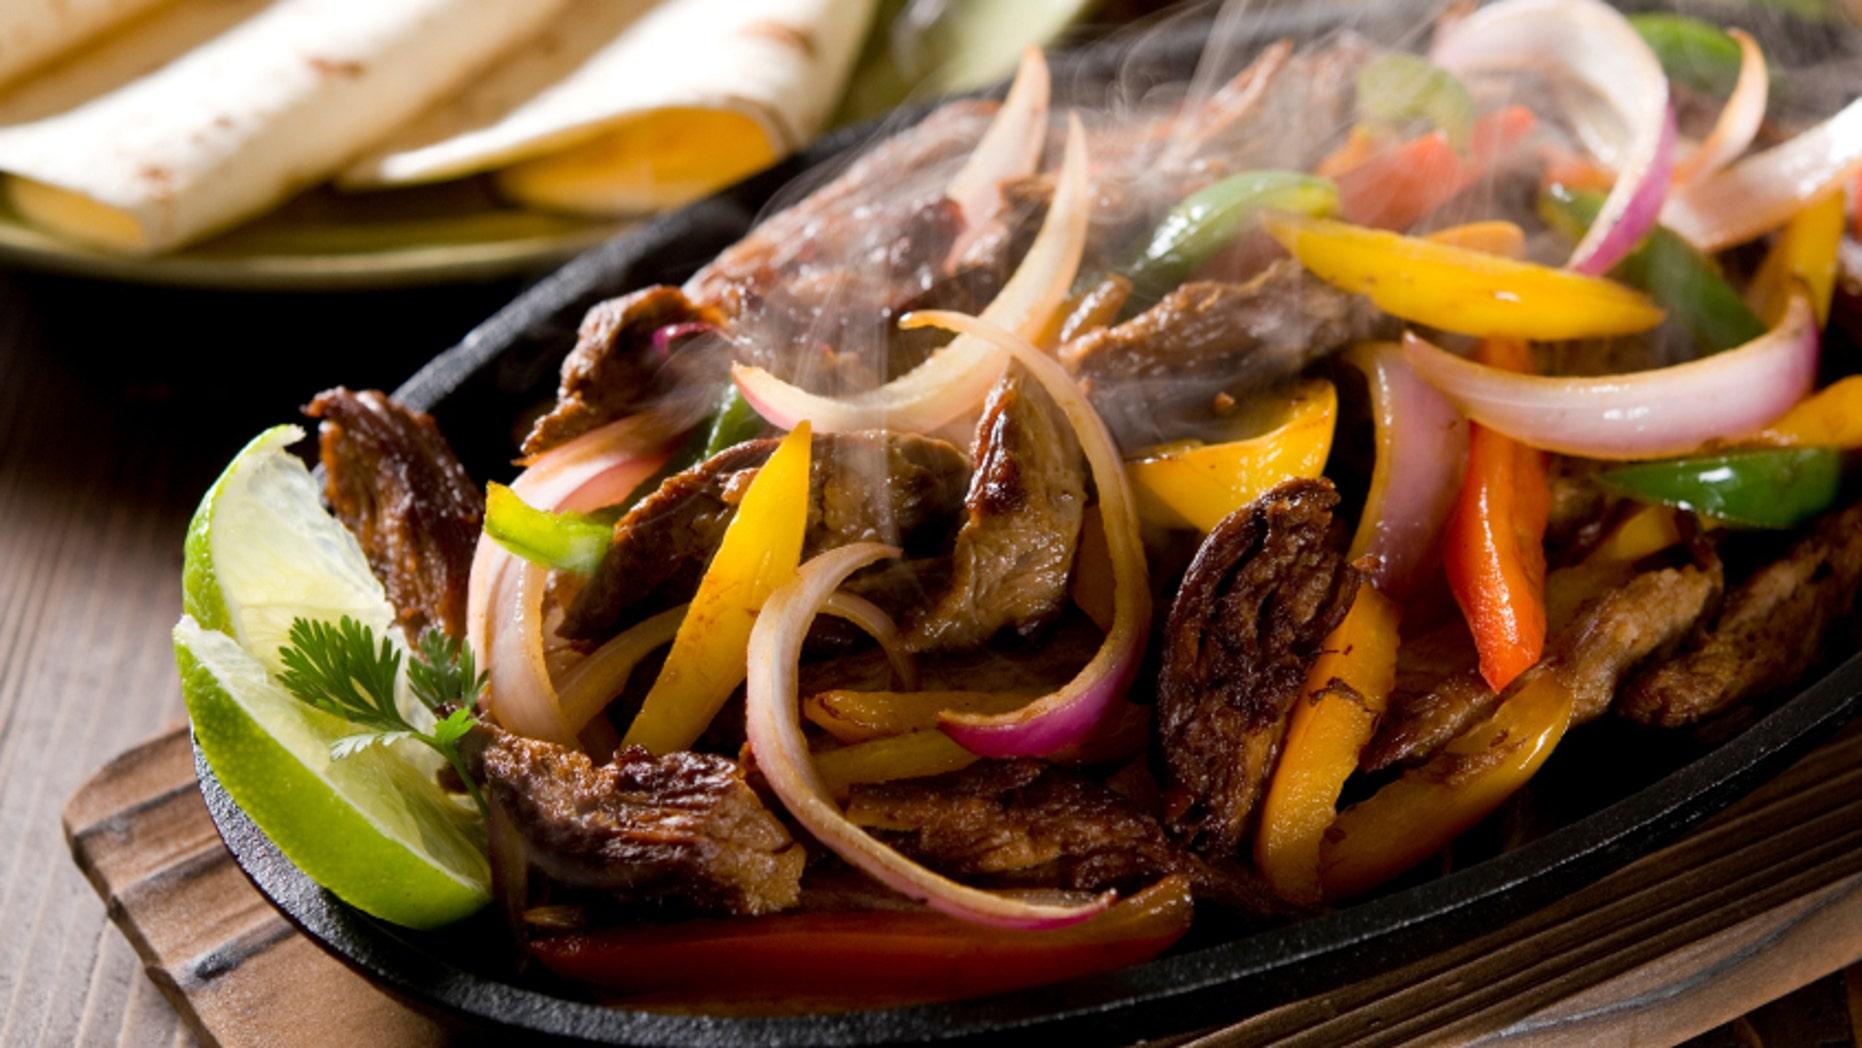 Easy fajitas may become your favorite weeknight recipe.